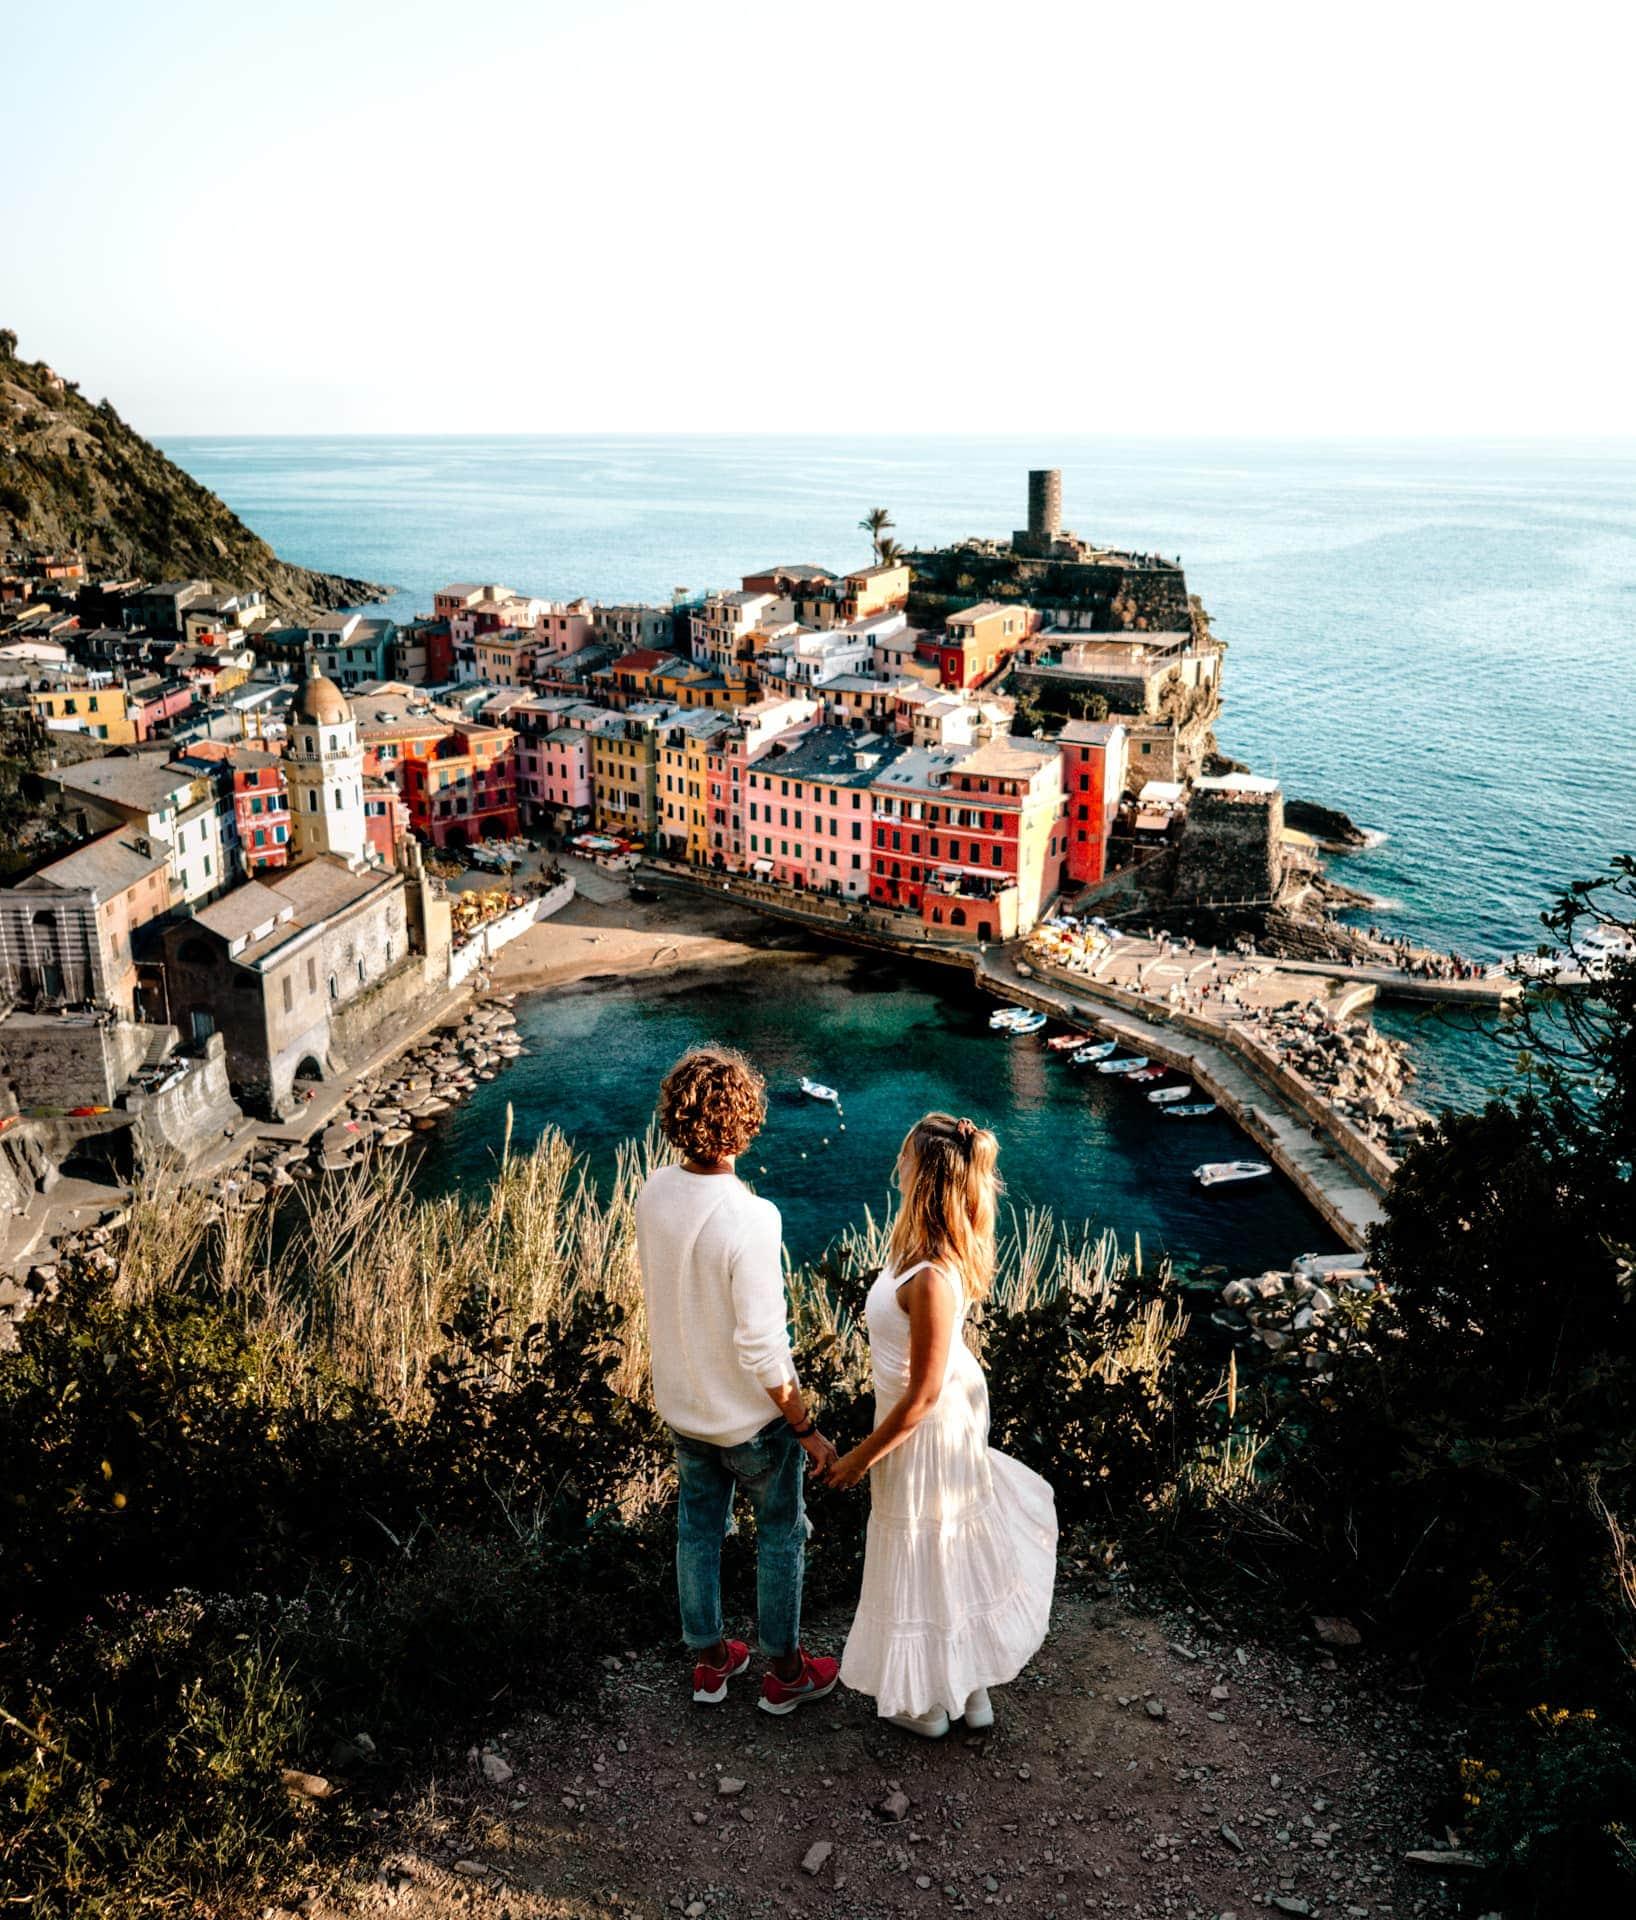 Cinque Terre Italië Vernazza beste uitzicht